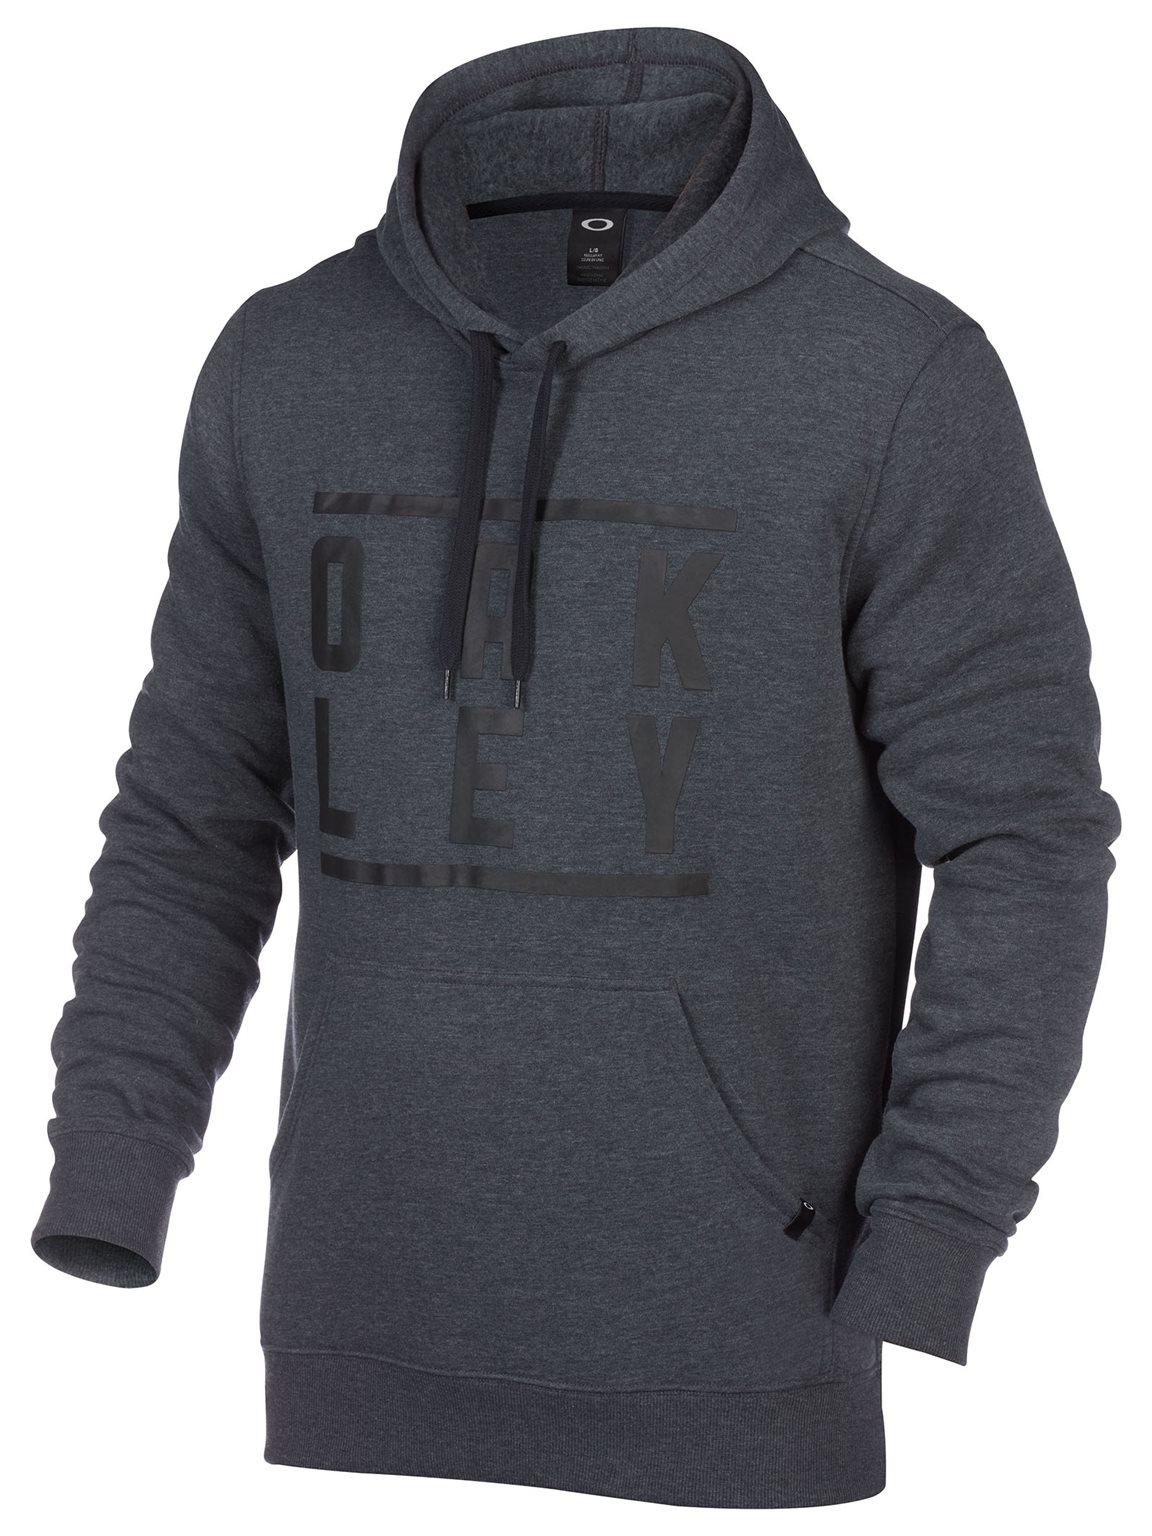 fcc46284b6 OAKLEY pulóver TOKEN fekete | aunergyor.hu